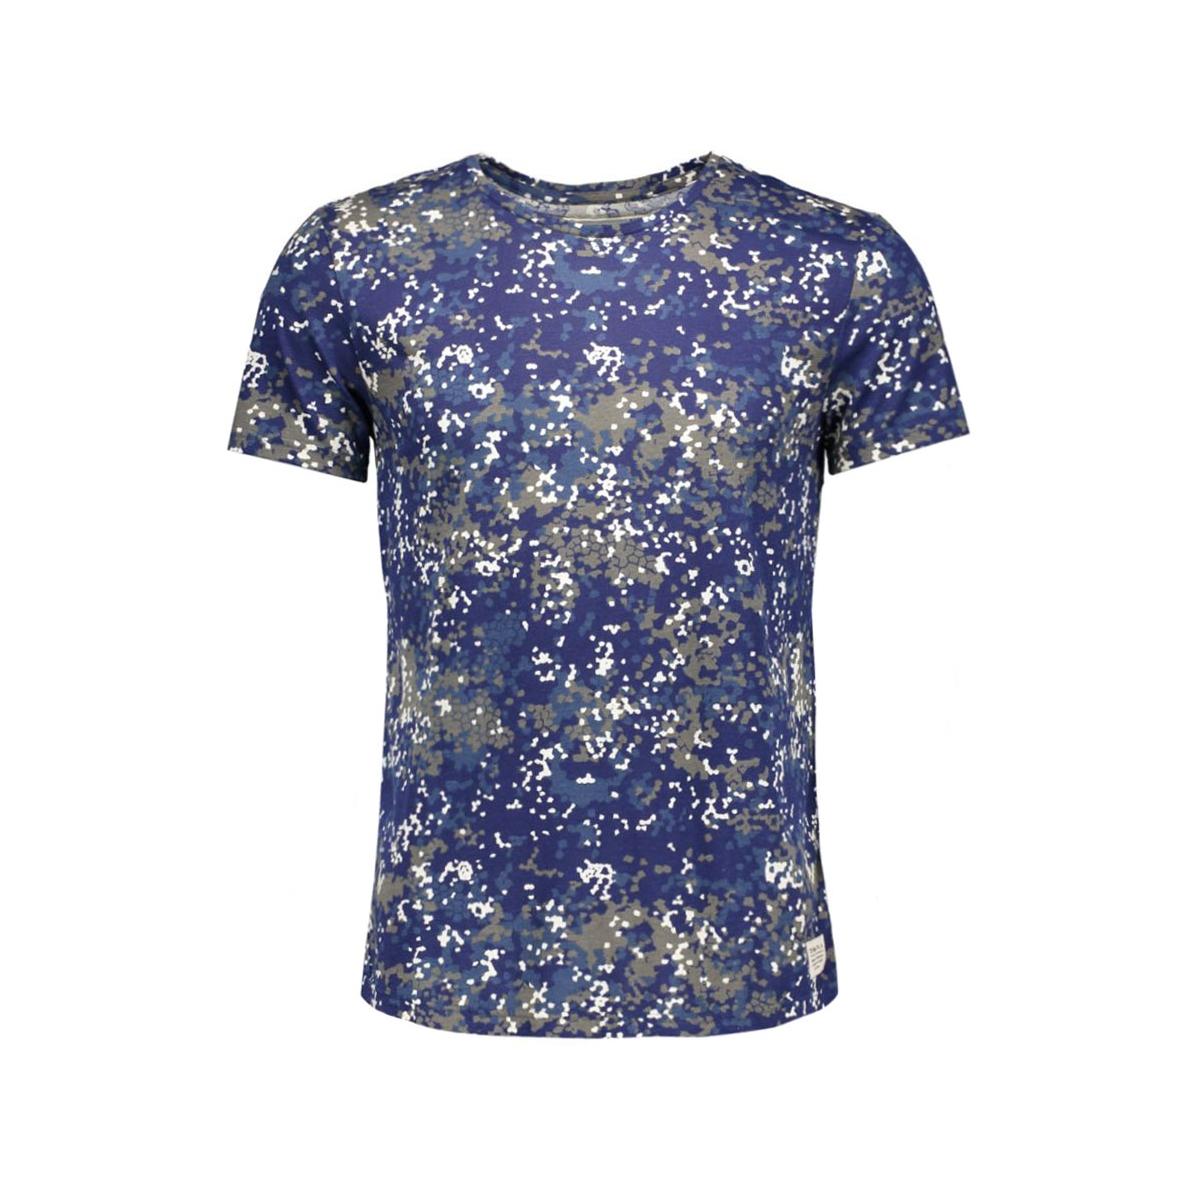 1036198.00.12 tom tailor t-shirt 6748